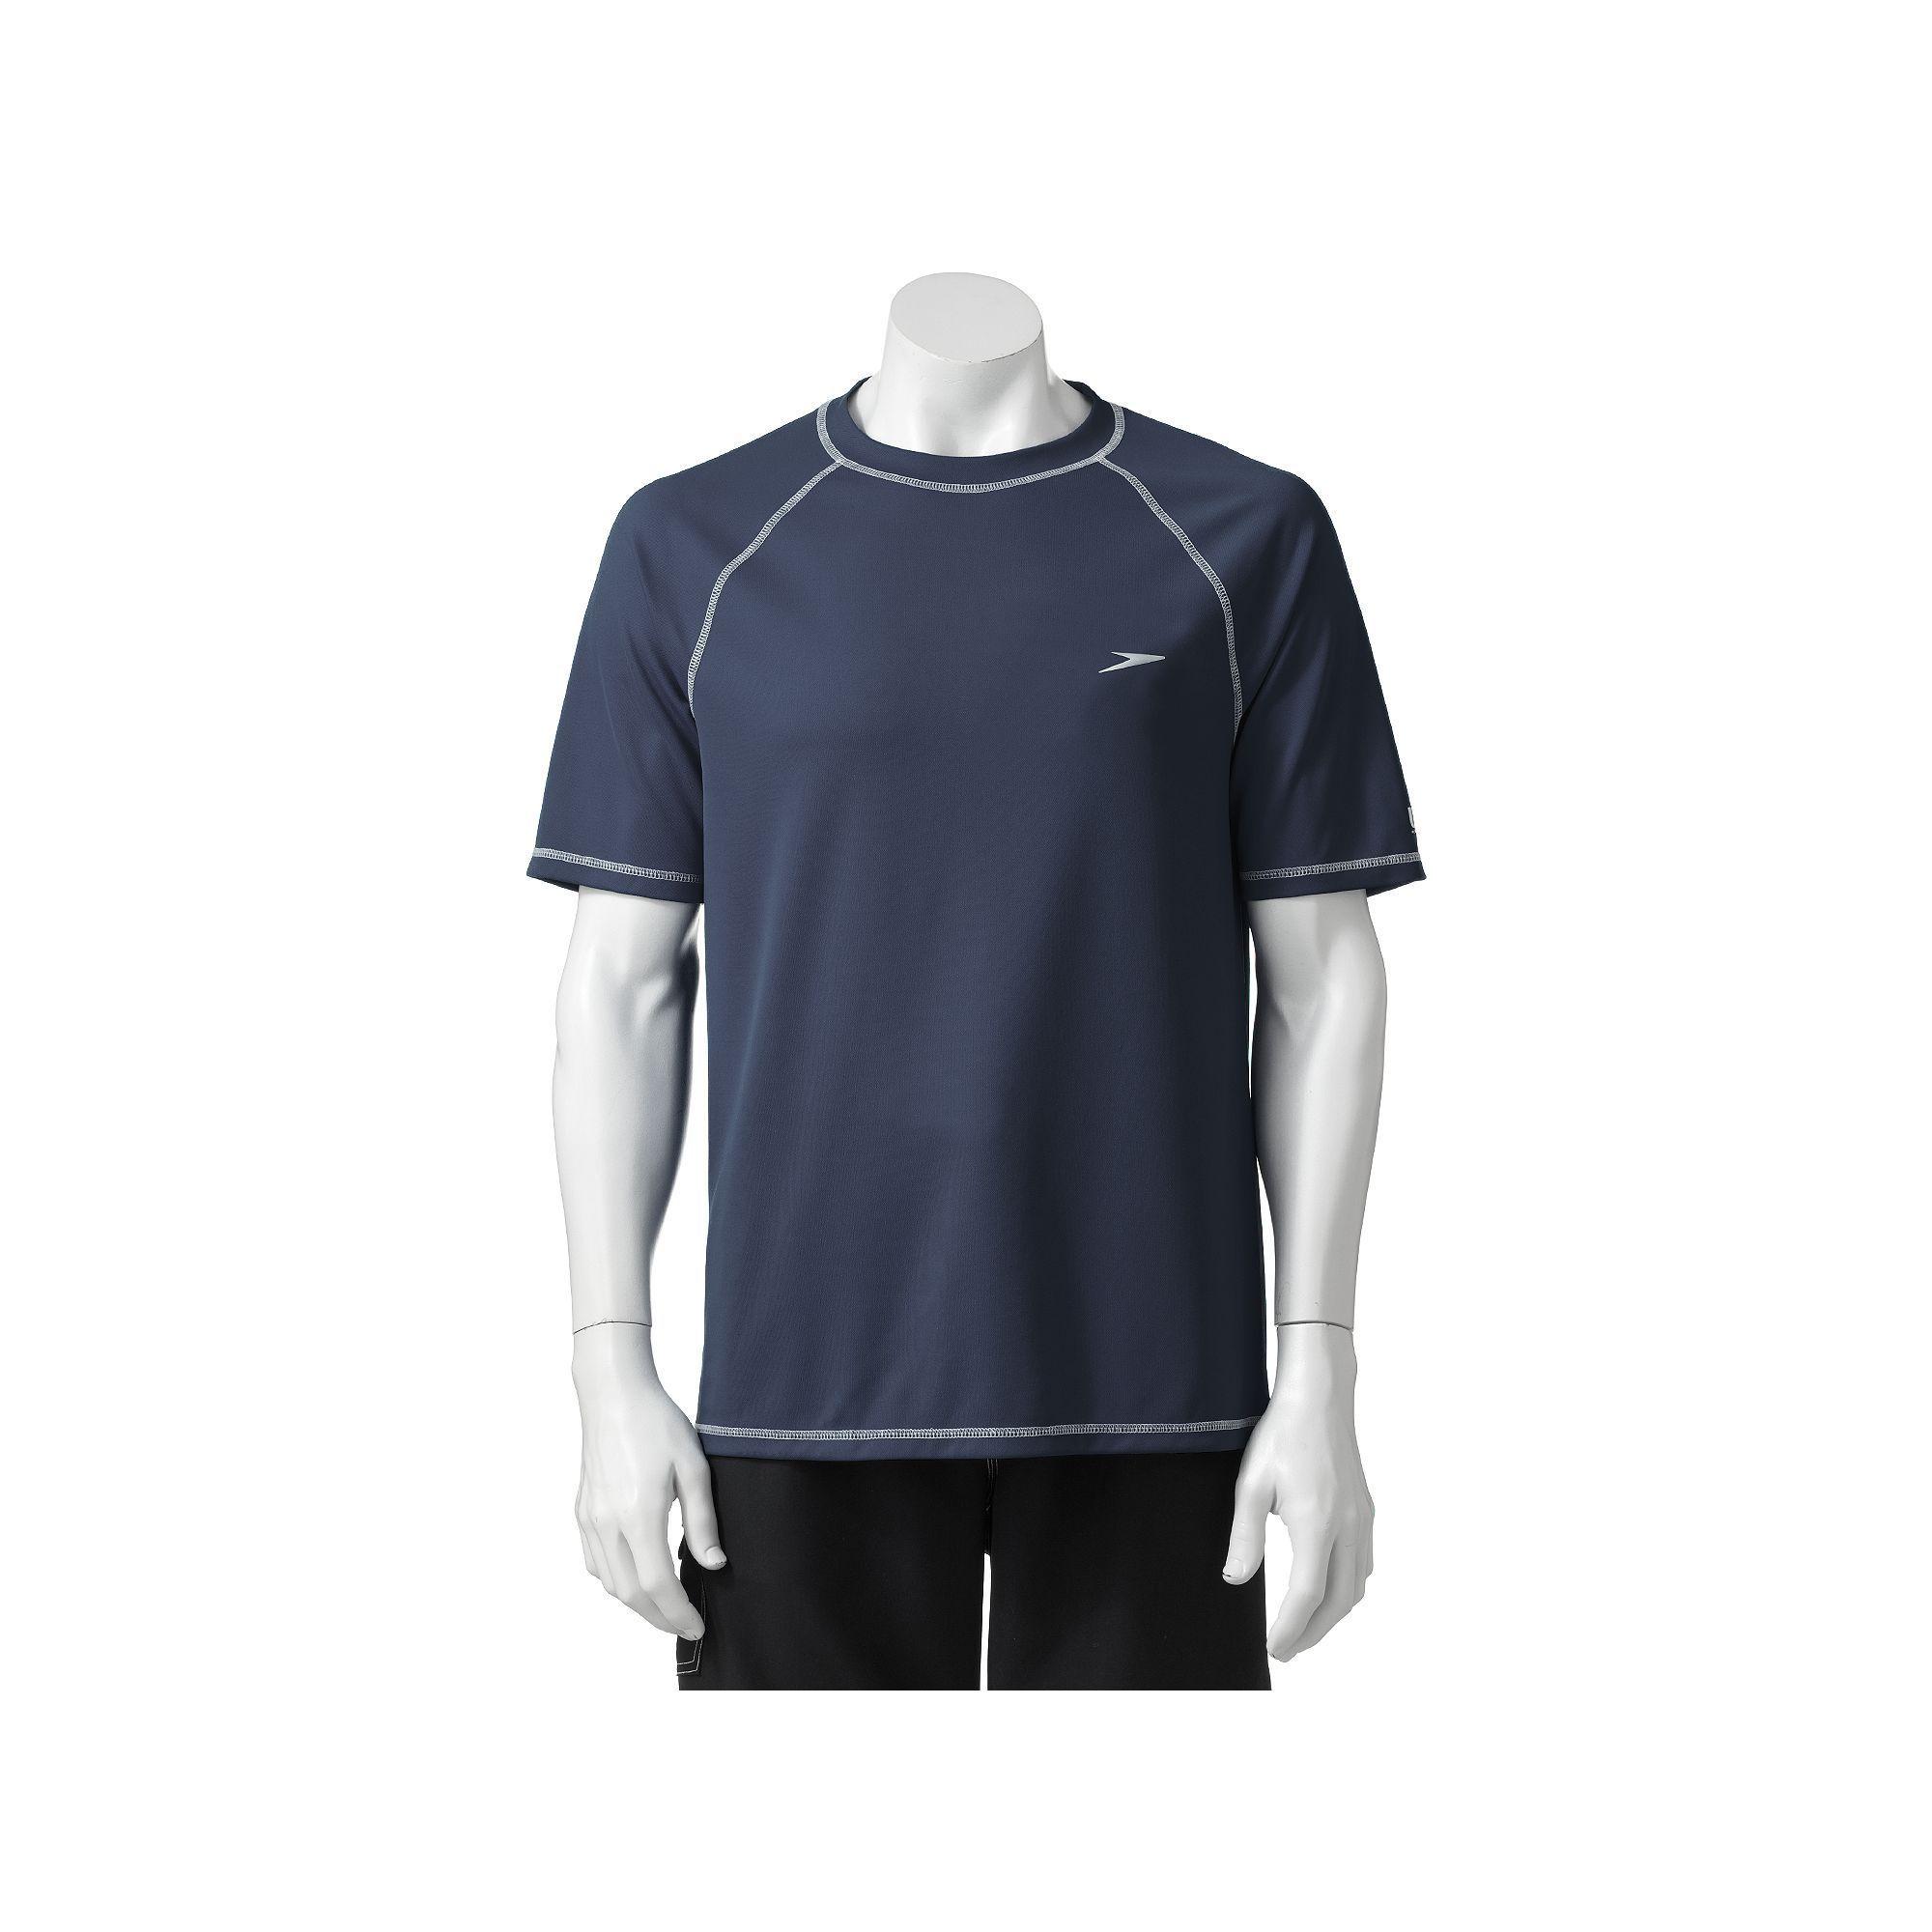 848496d5545 Swim Shirts Kohls | Toffee Art